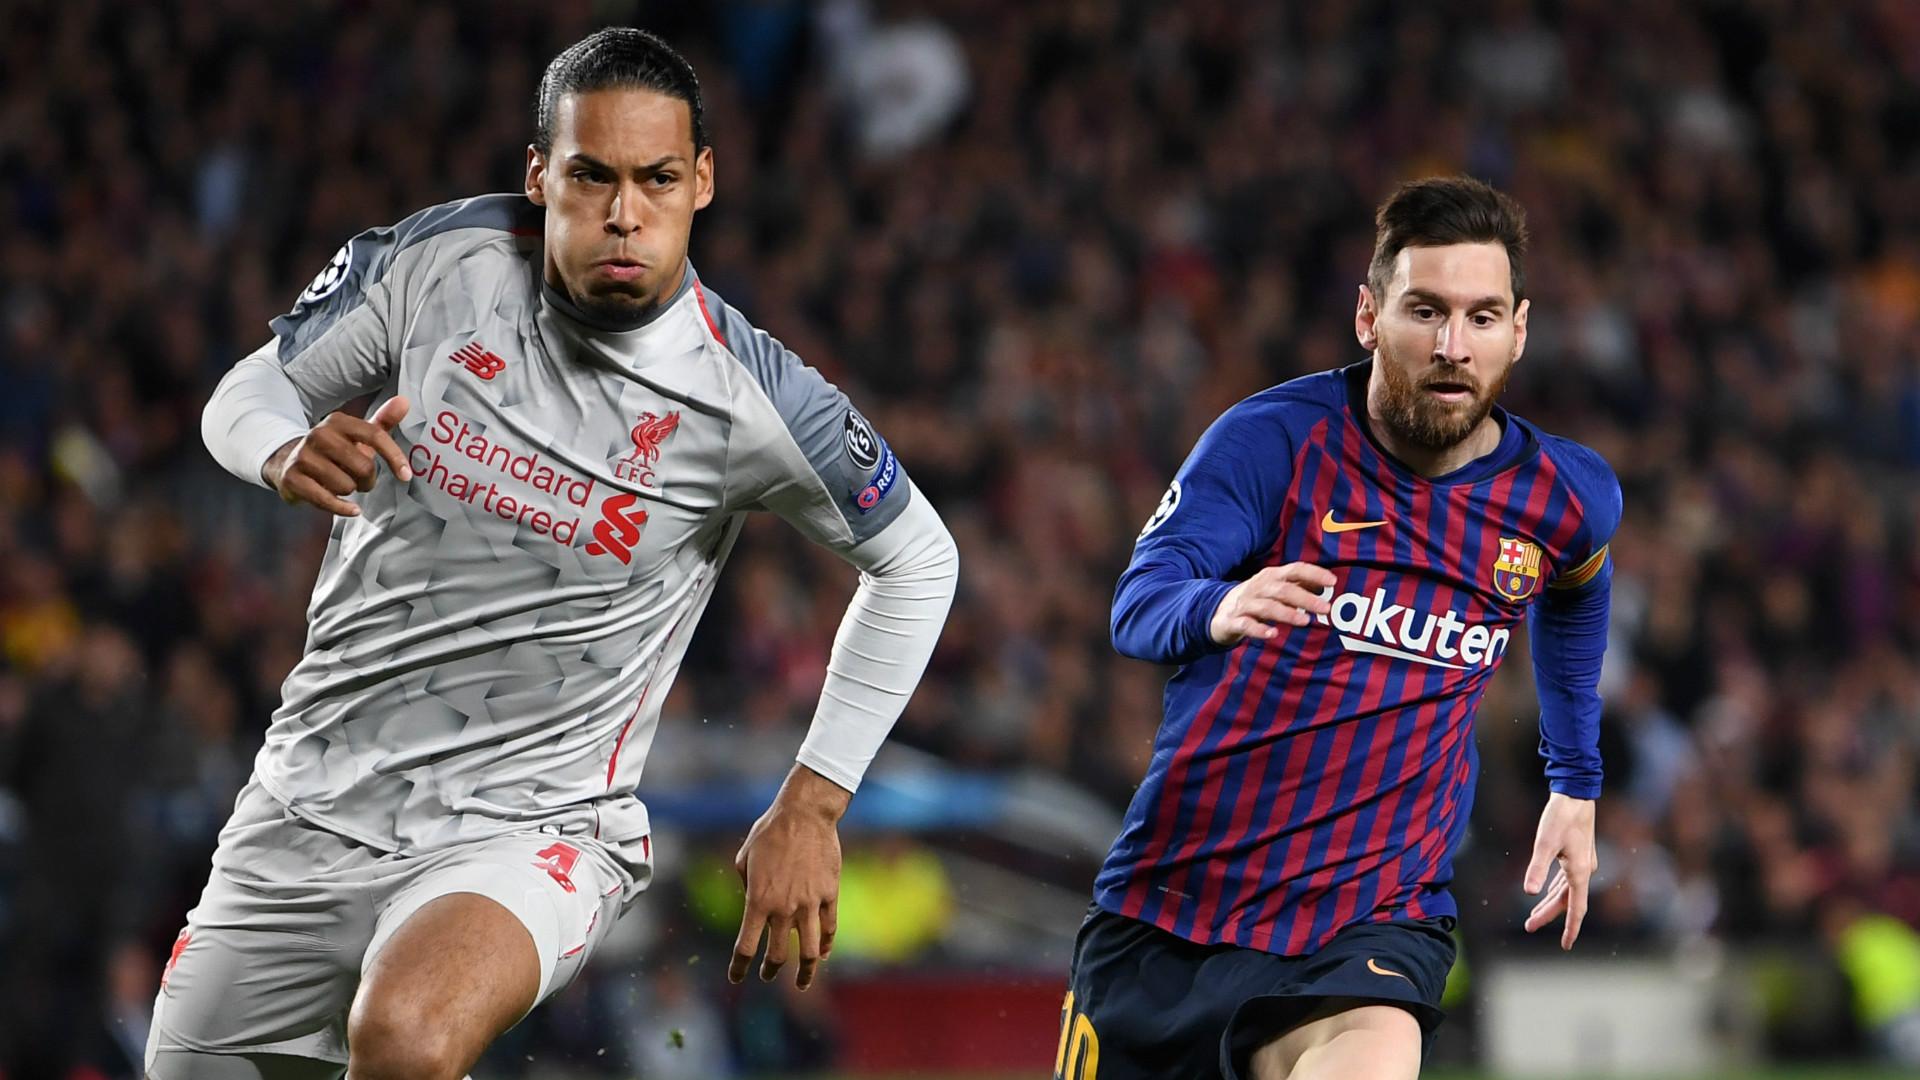 Messi Lauds Van Dijk As The Ultimate Defender Ahead Of Ballon D Or Battle Goal Com